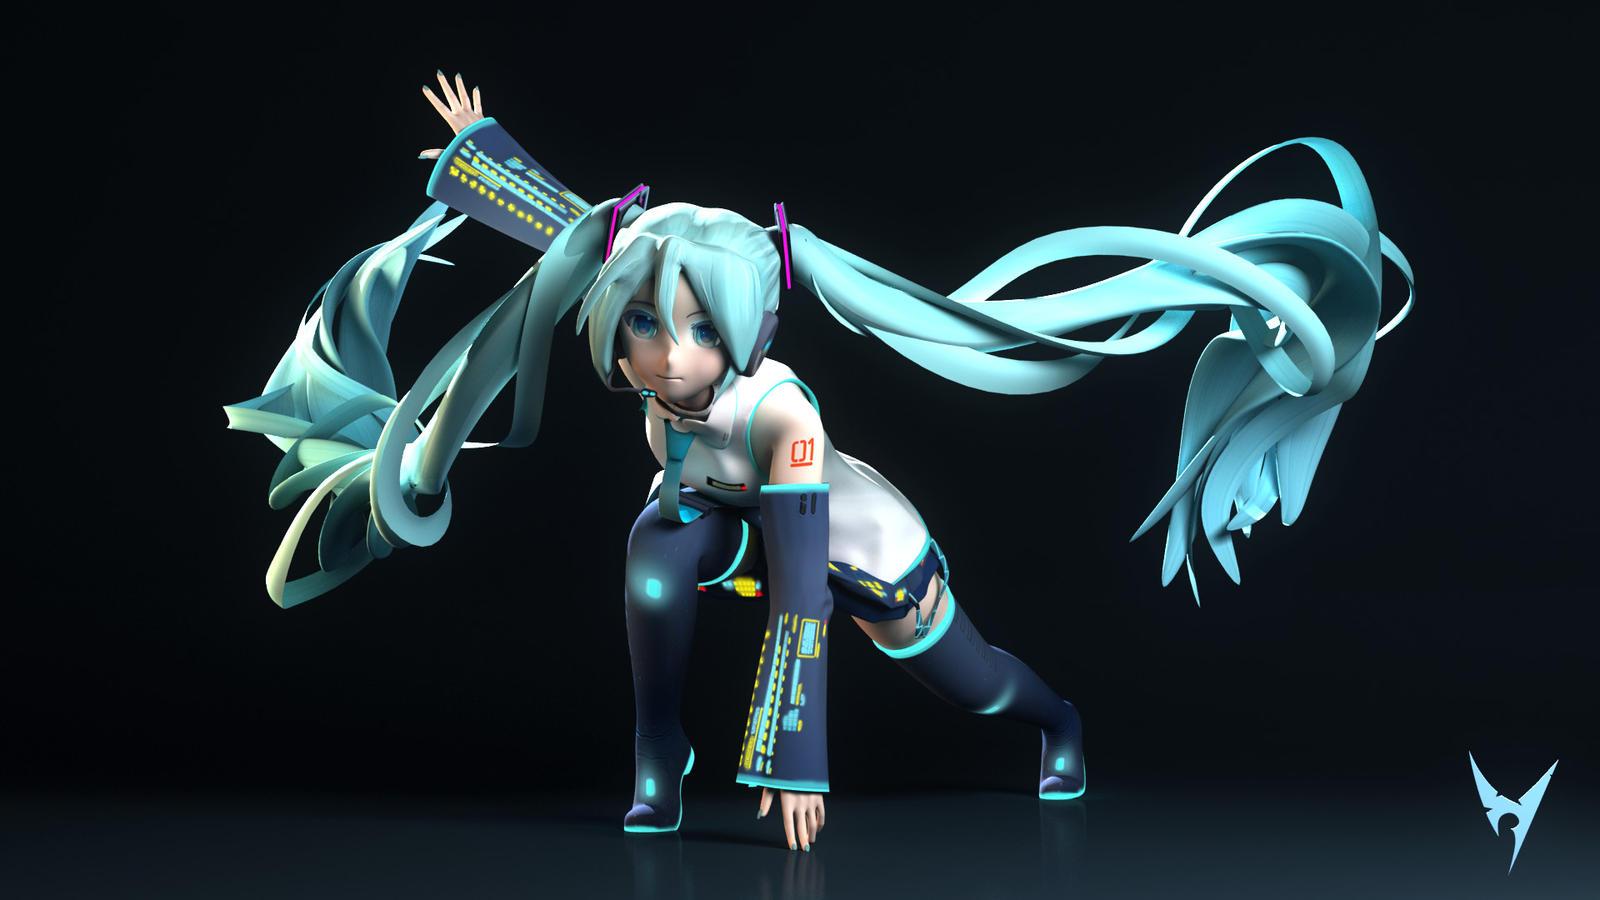 Hatsune Miku -- Pose#01 by Victim753